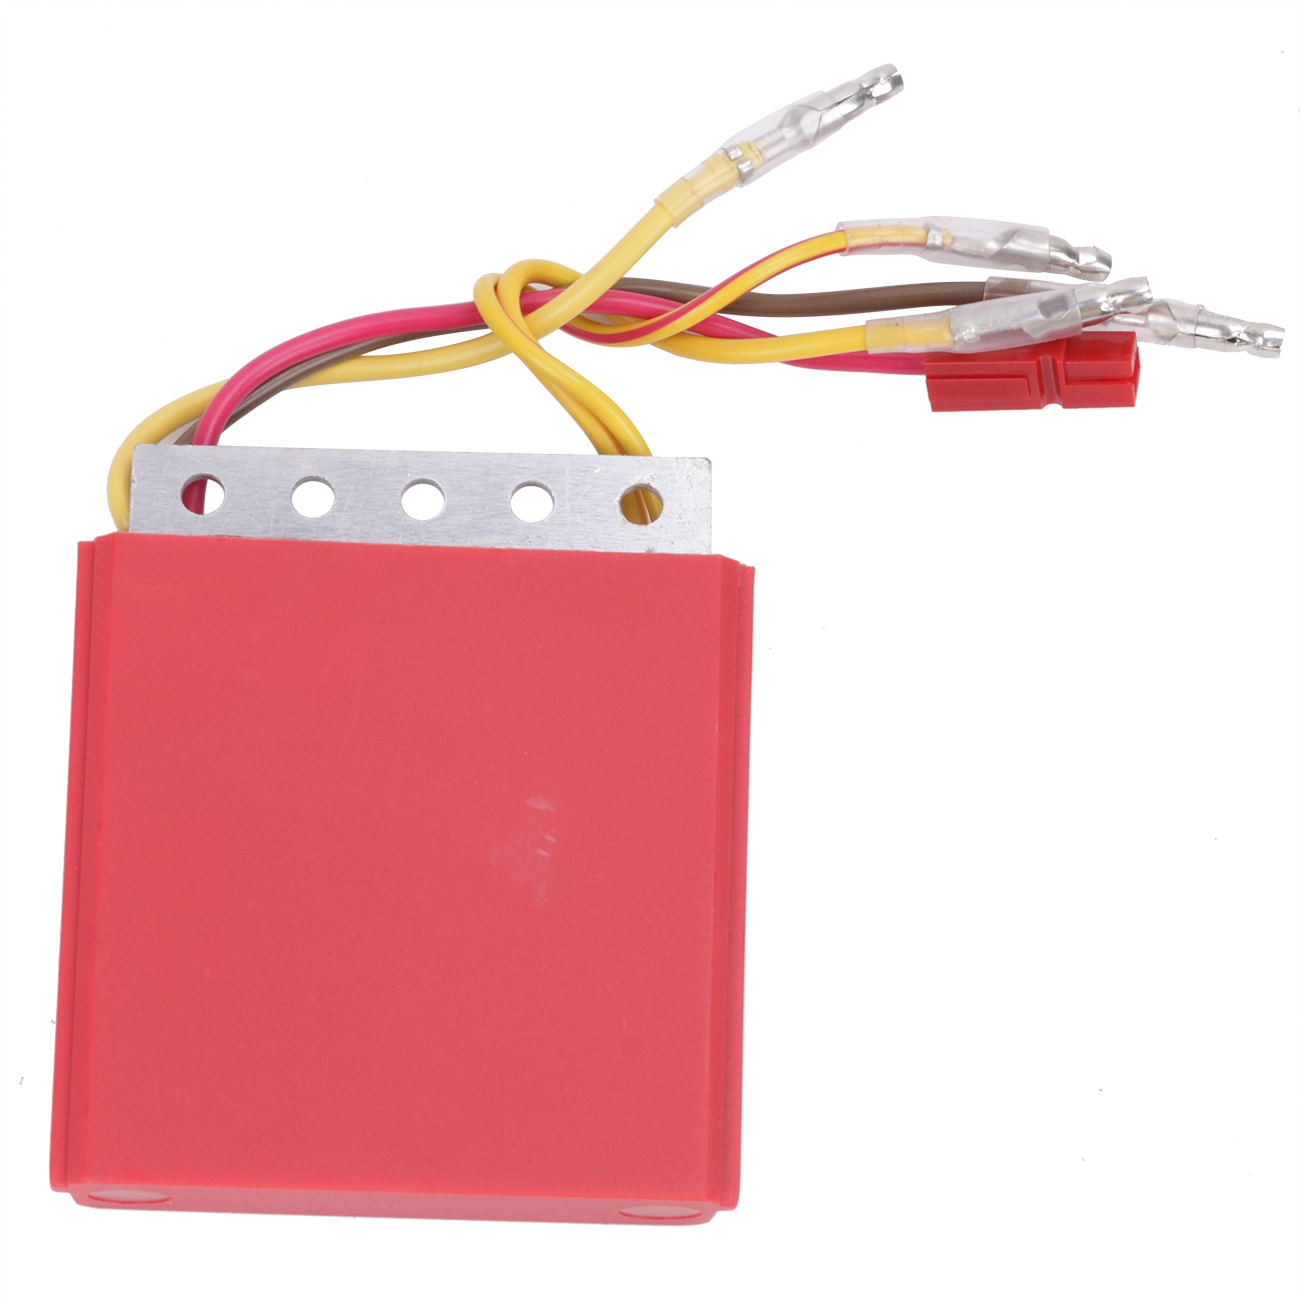 Replacement Voltage Regulator Rectifier For Polaris Sportsman 700 4x4 Carb 2004